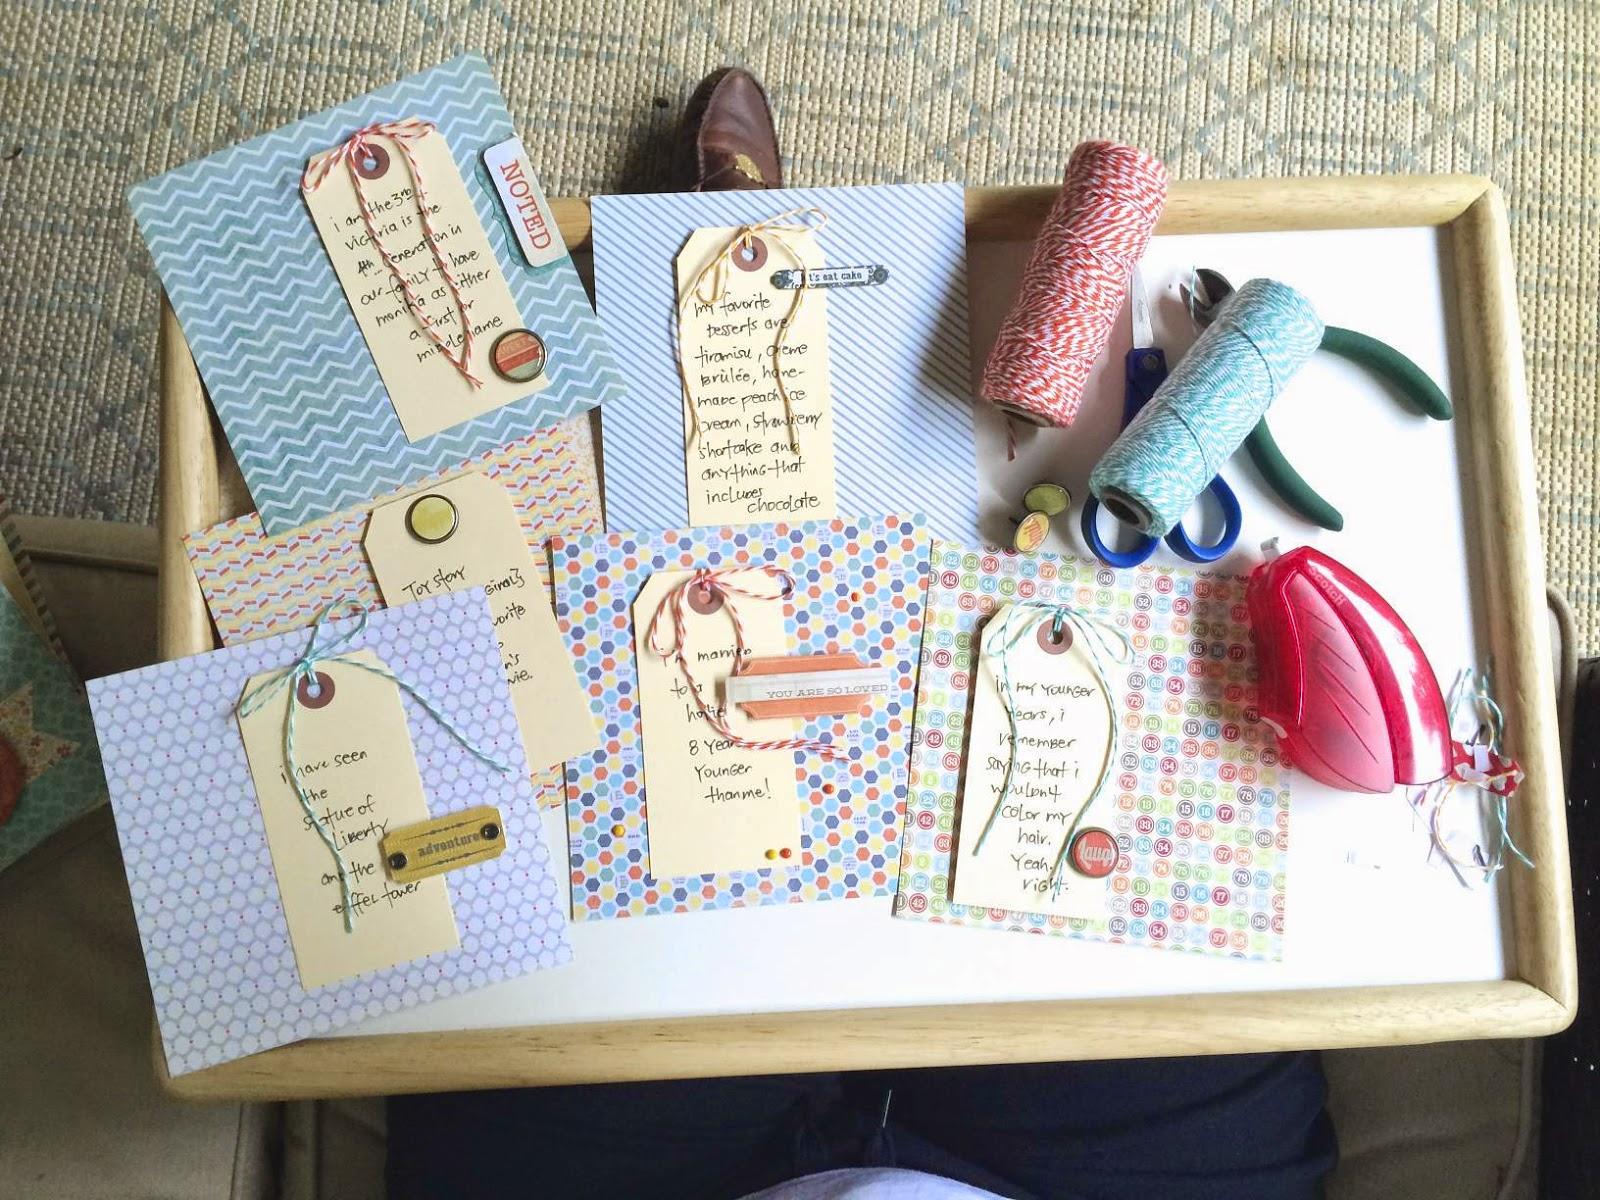 #mini album #scrapbooking #paper pads  #baker's twine